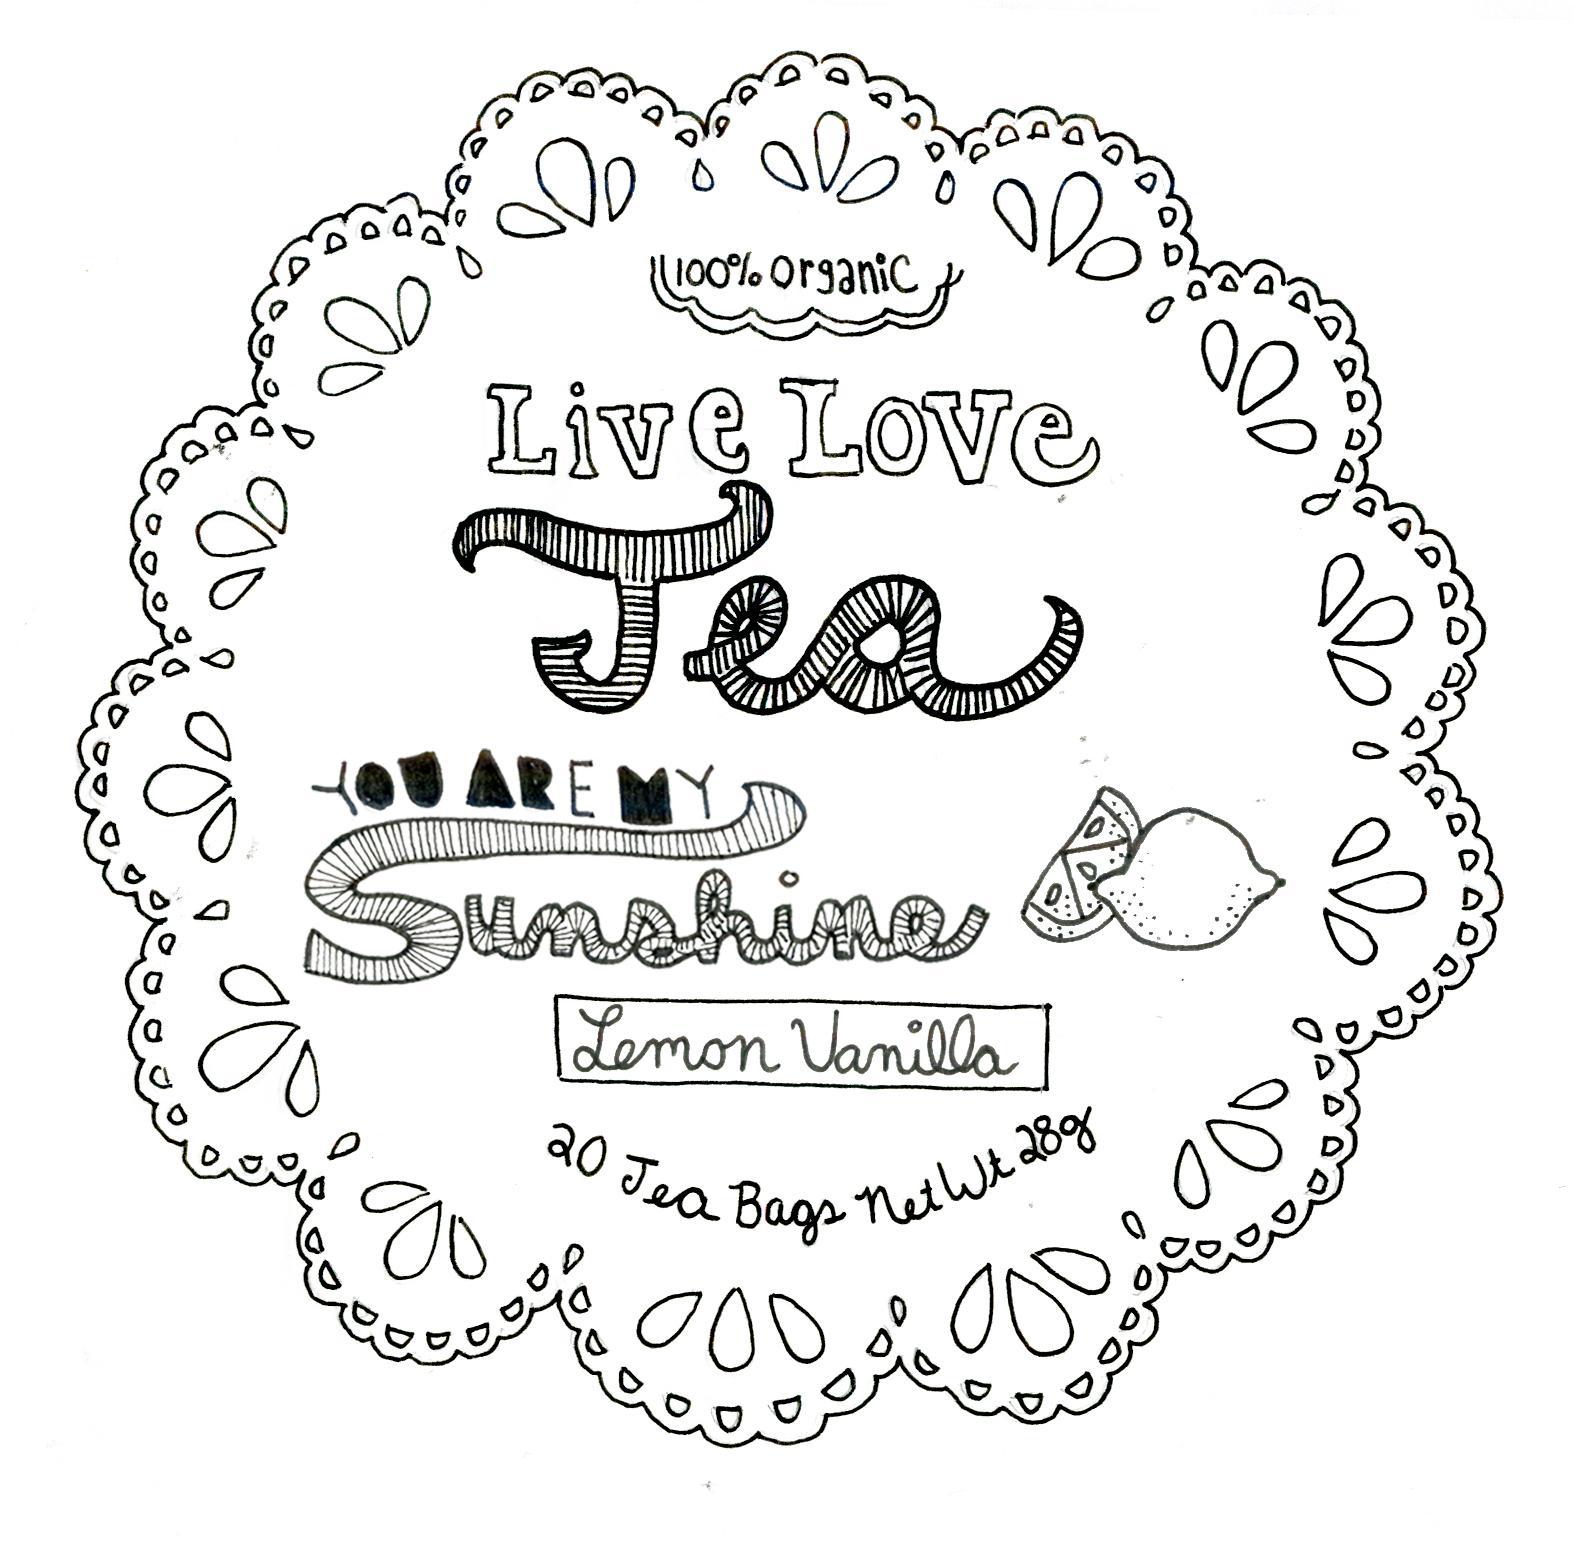 Live.Love.Tea. - image 17 - student project